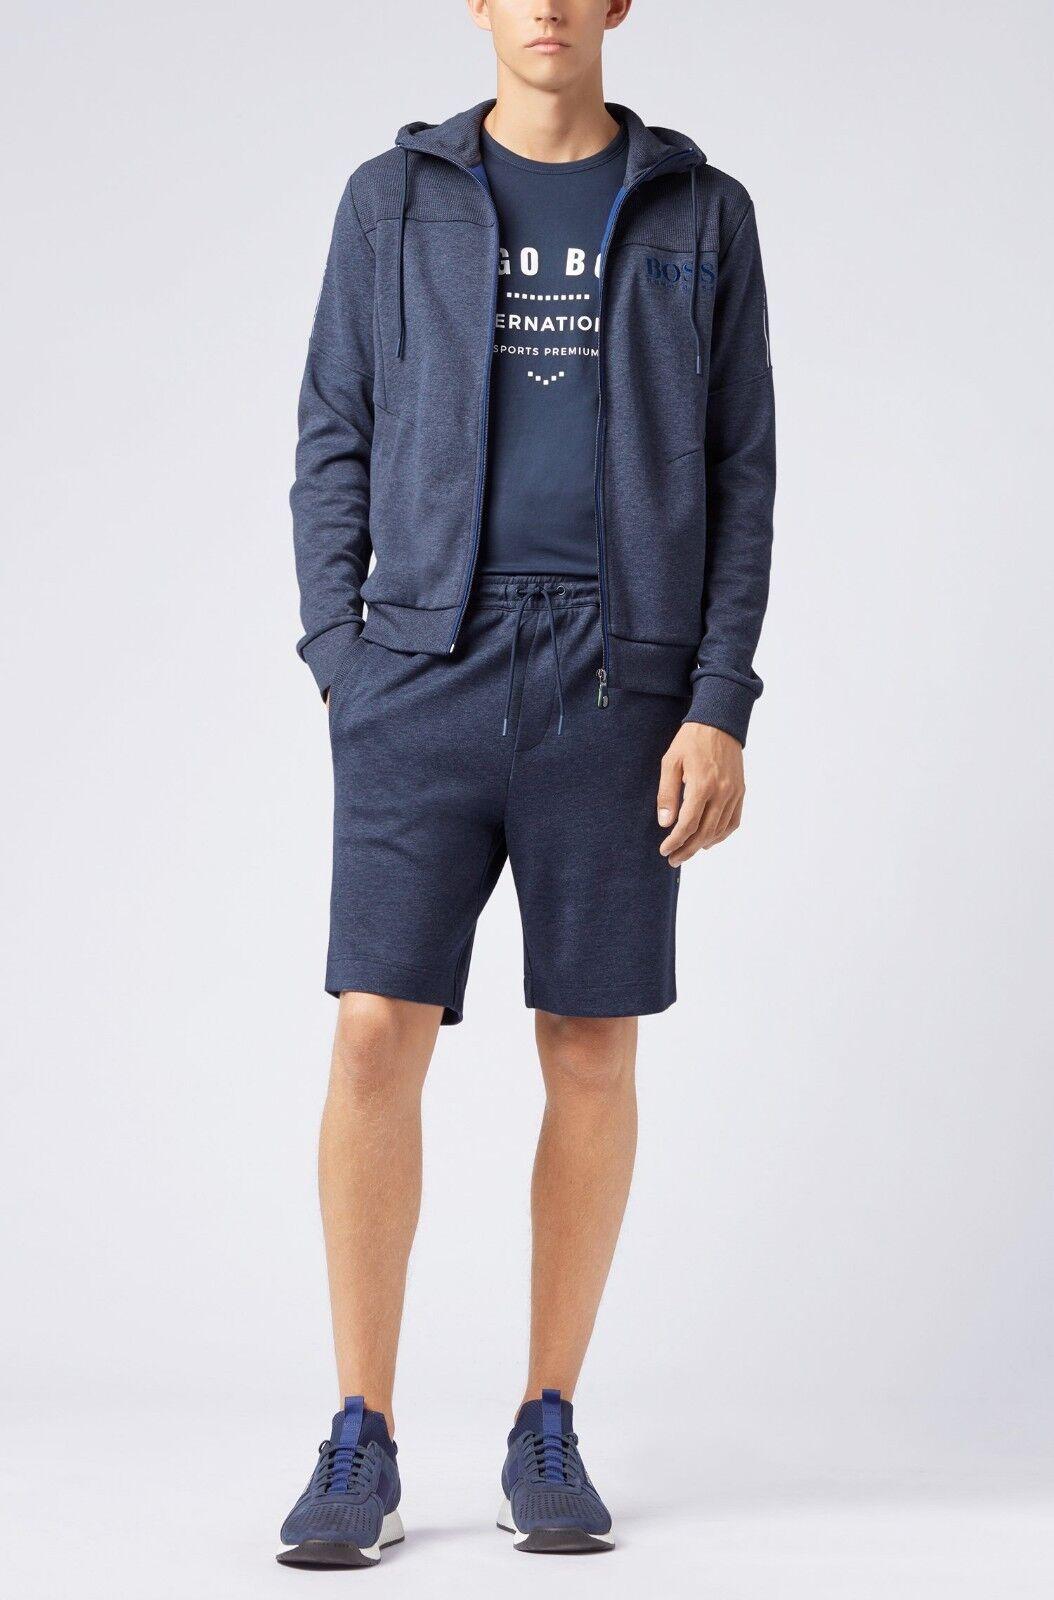 HUGO BOSS BOSS BOSS Hooded sweatshirt with contrast zip and logo detail Größe S 2995c2